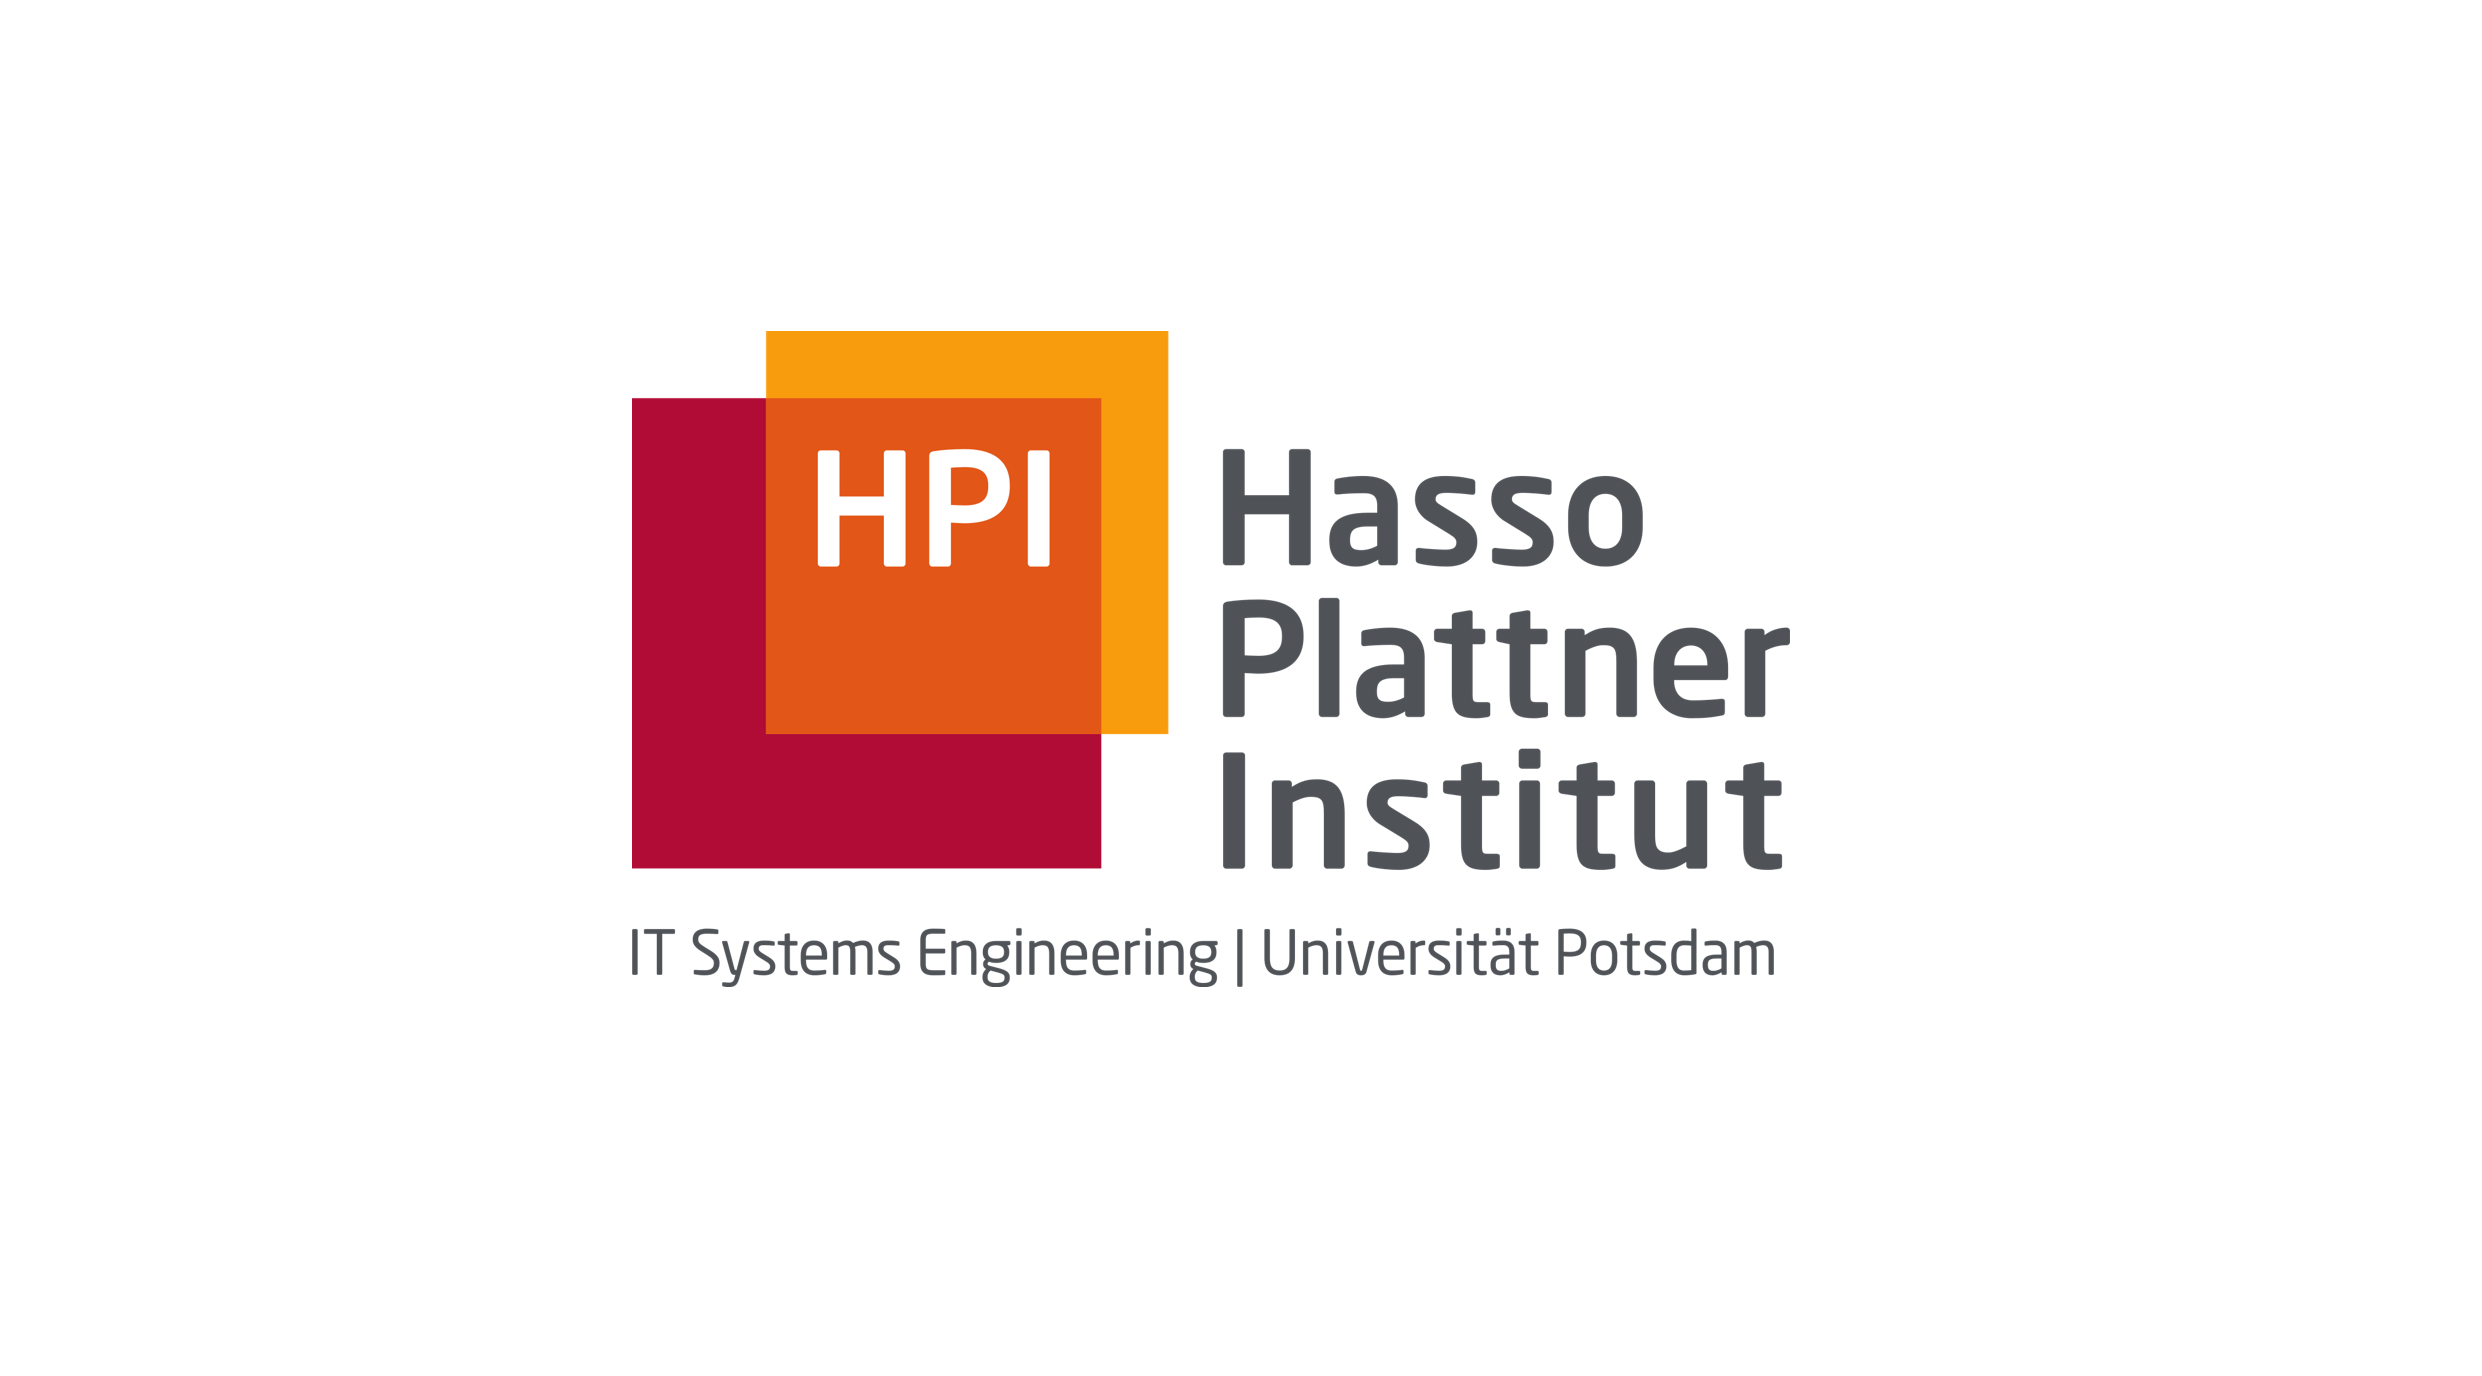 HPI.png